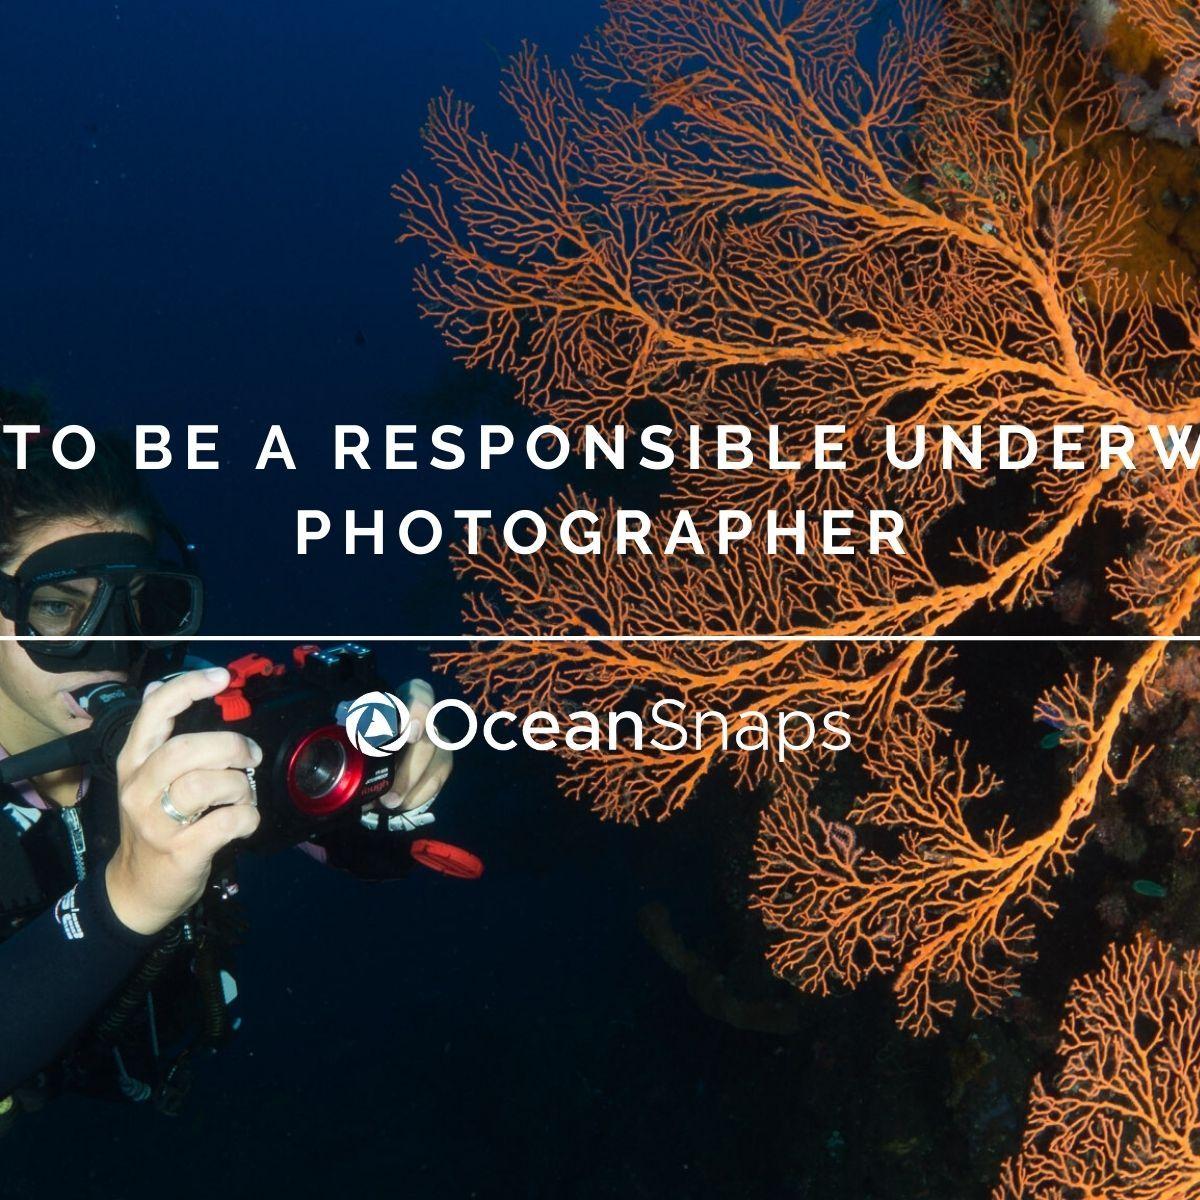 Responsible underwater photographer